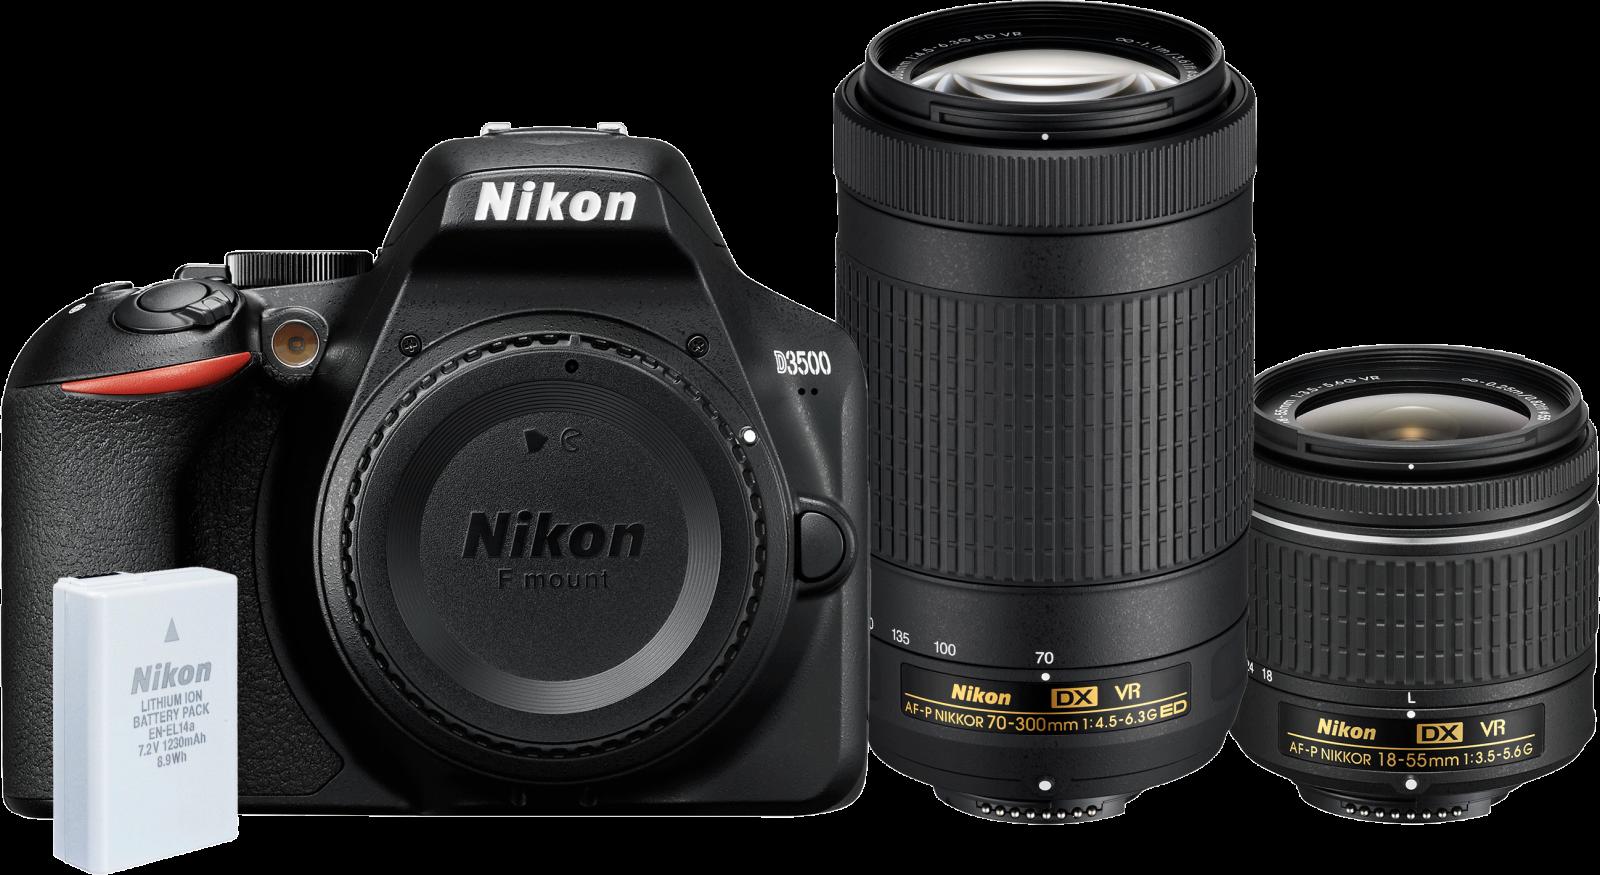 Nikon D3500 DSLR Camera with 18-55mm + 70-300mm Lens Kit